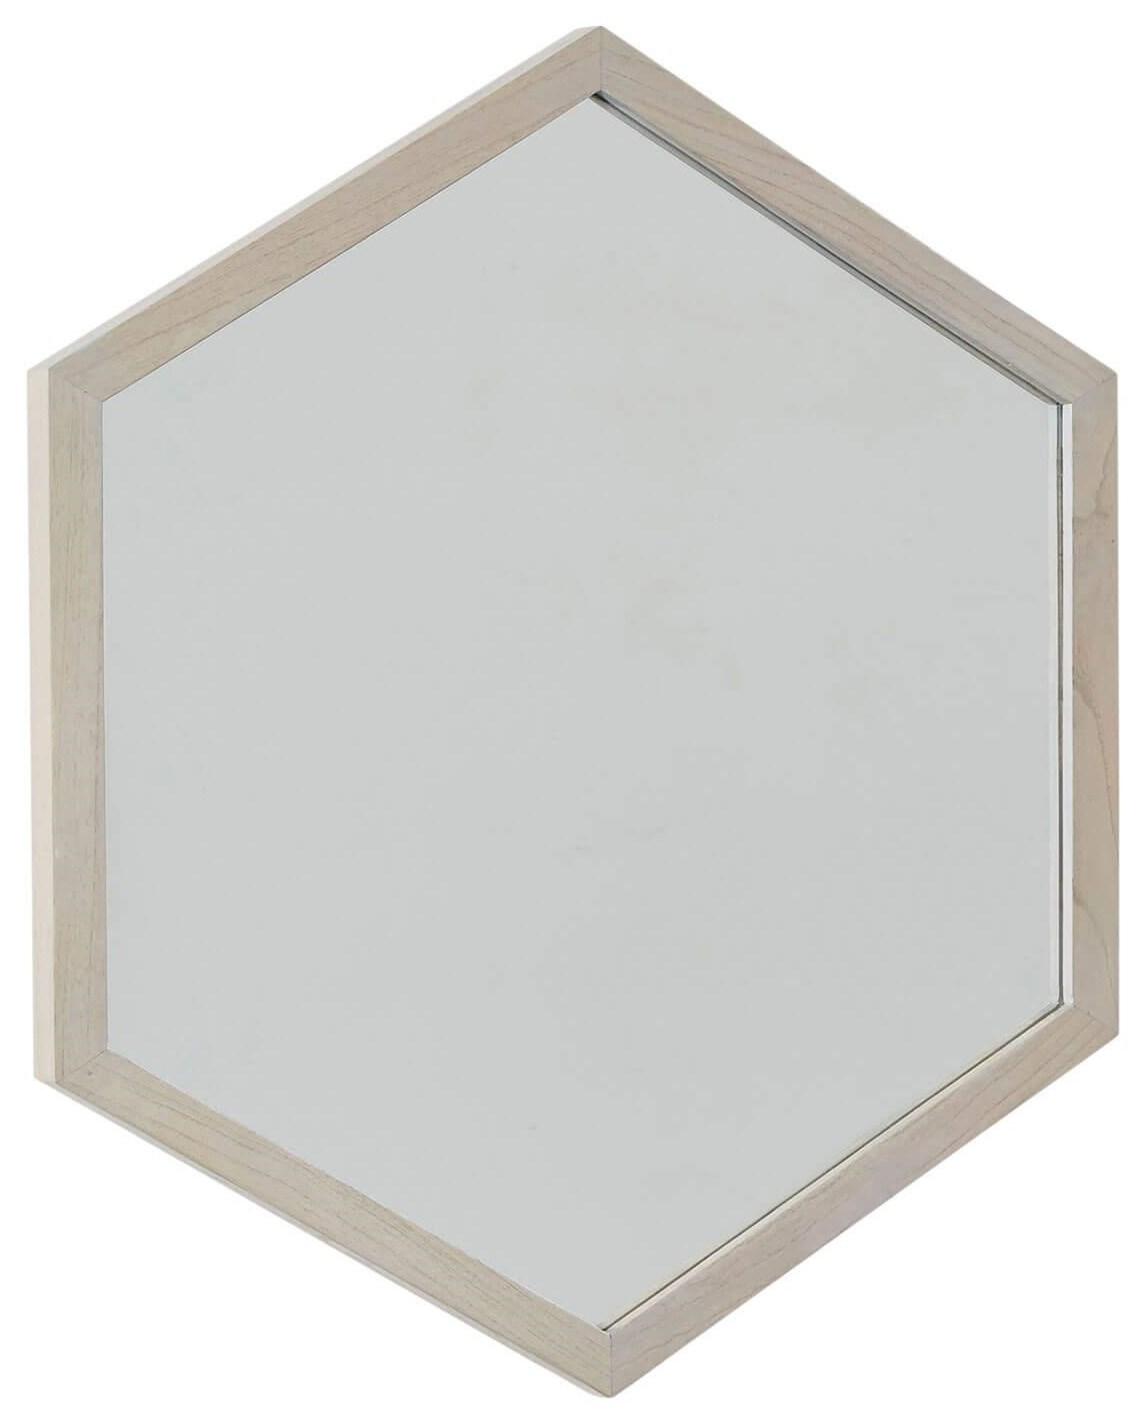 Sarah Richardson Vista Vista Hexagon Mirror by Palliser at Stoney Creek Furniture